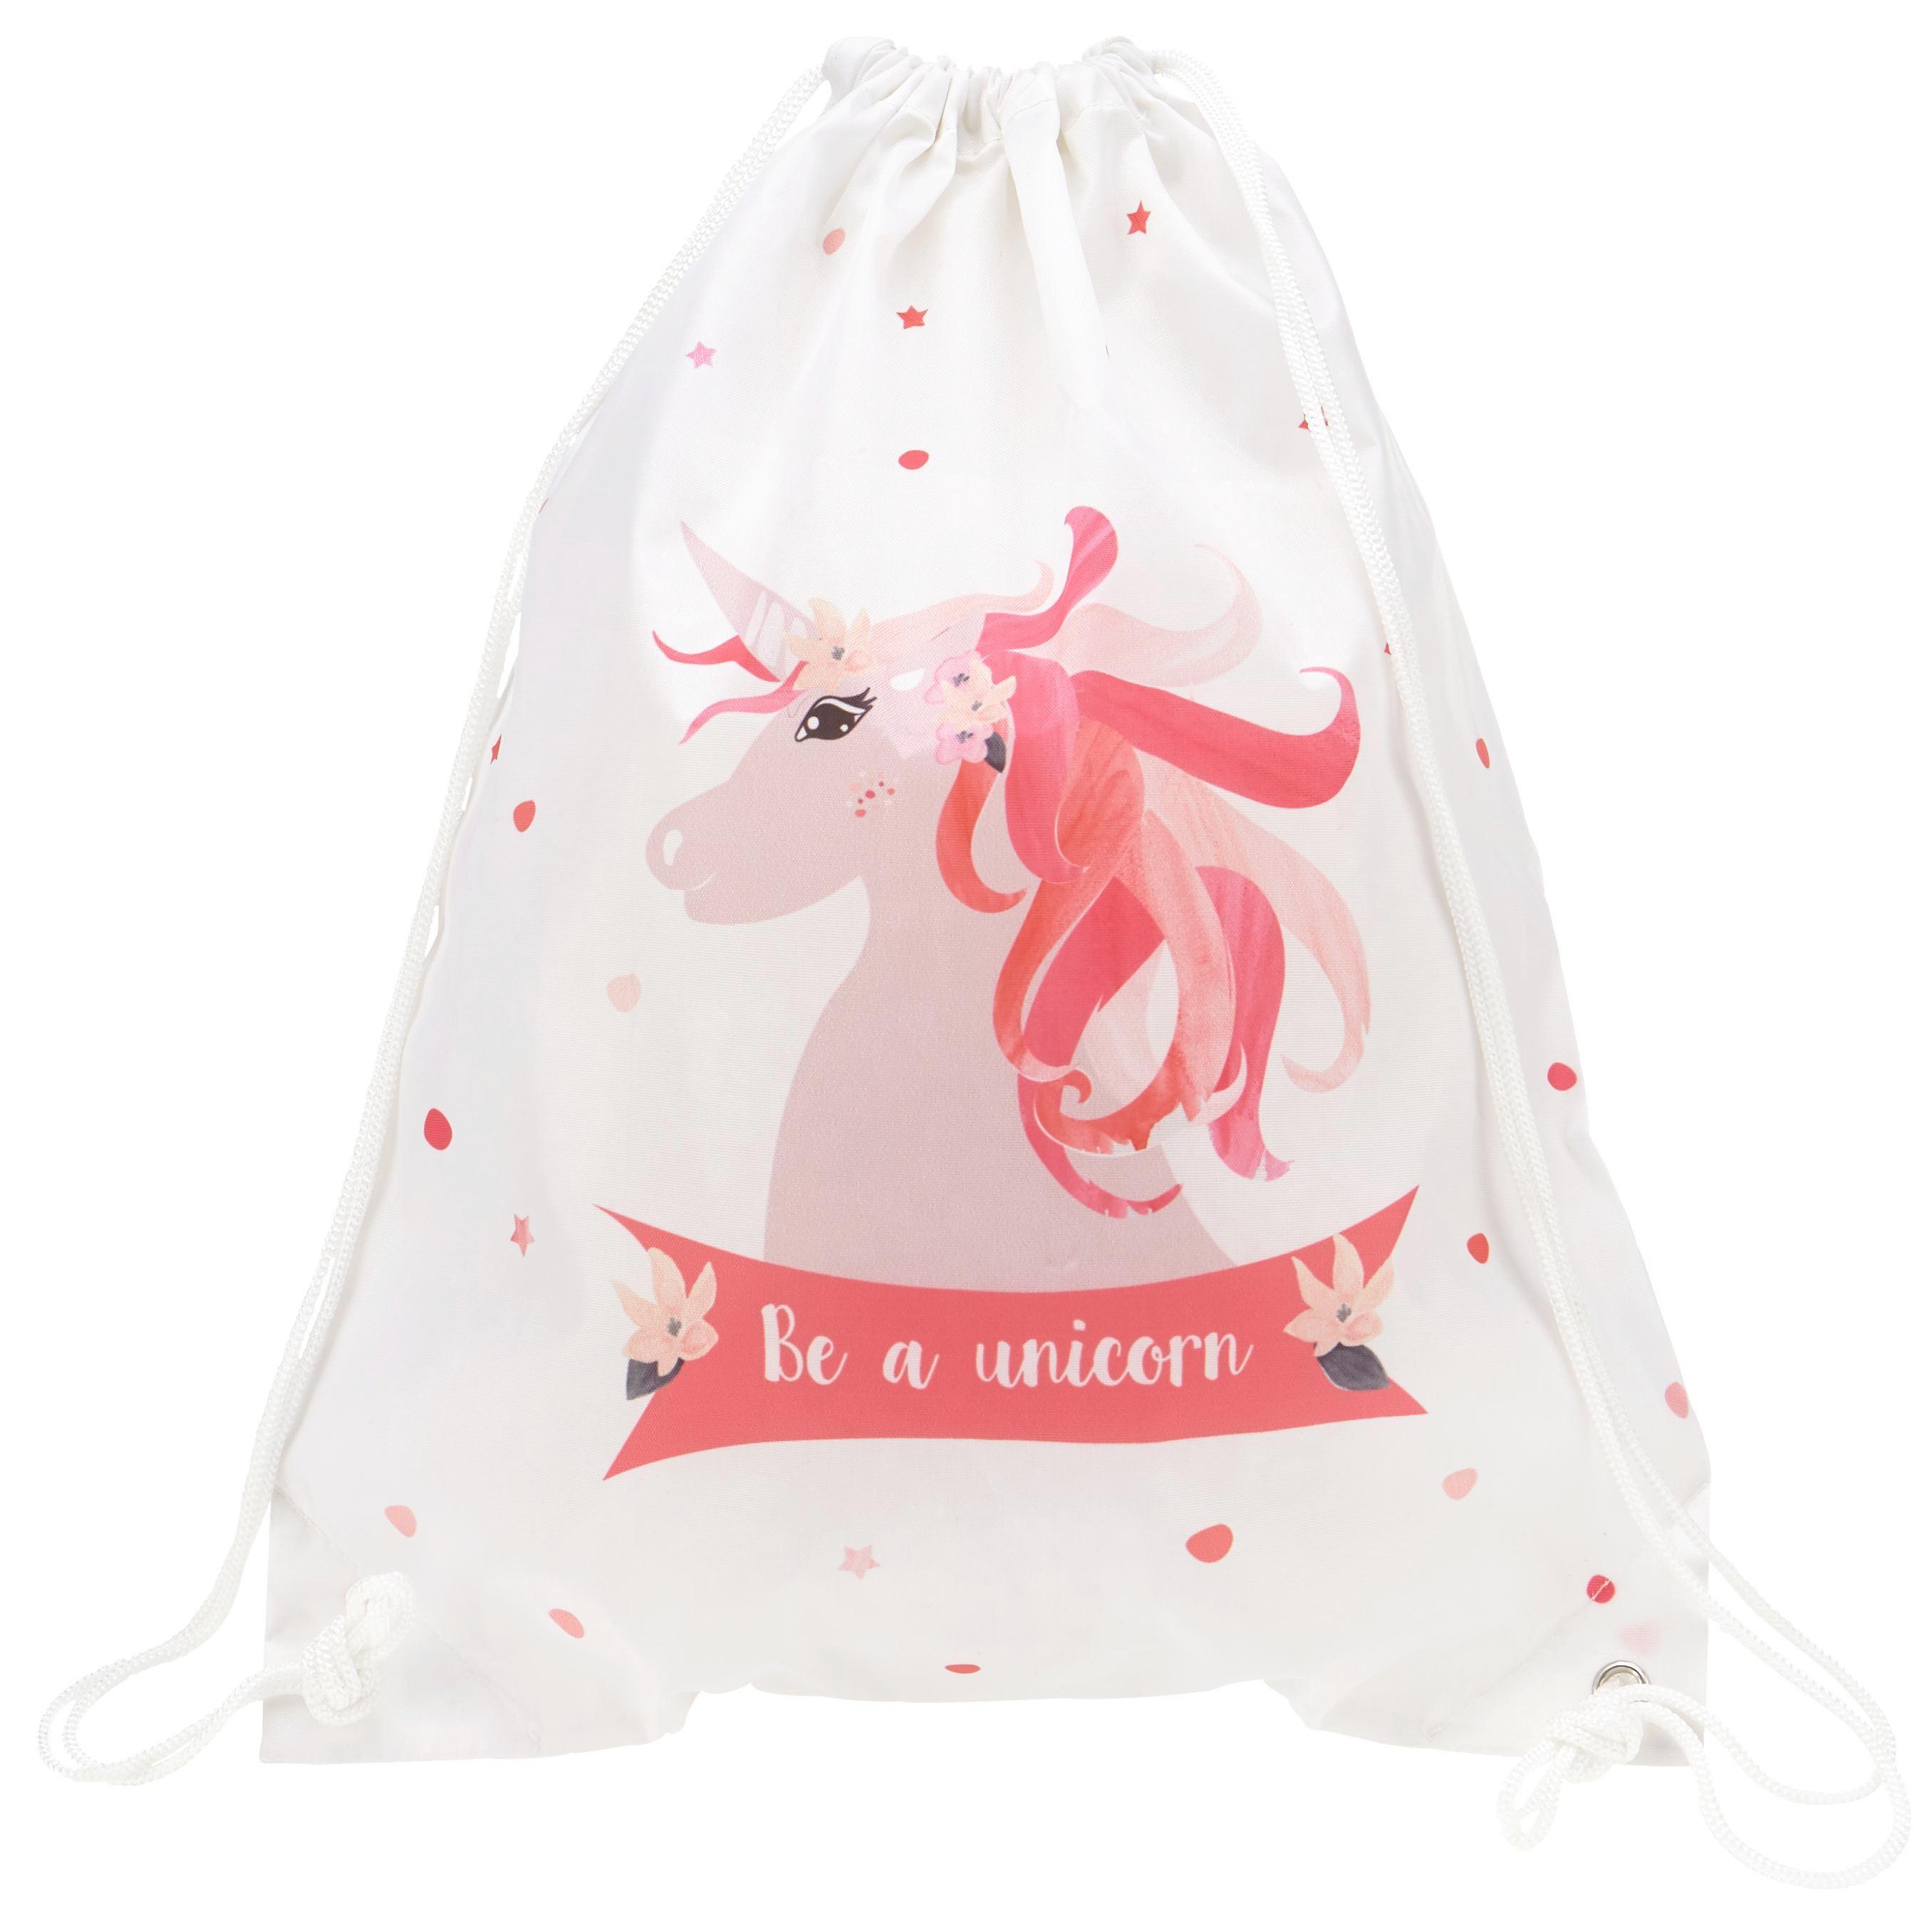 Sportbeutel Unicorn in Rosa/Weiß/pink - Pink/Rosa, Kunststoff (35/40/1cm)